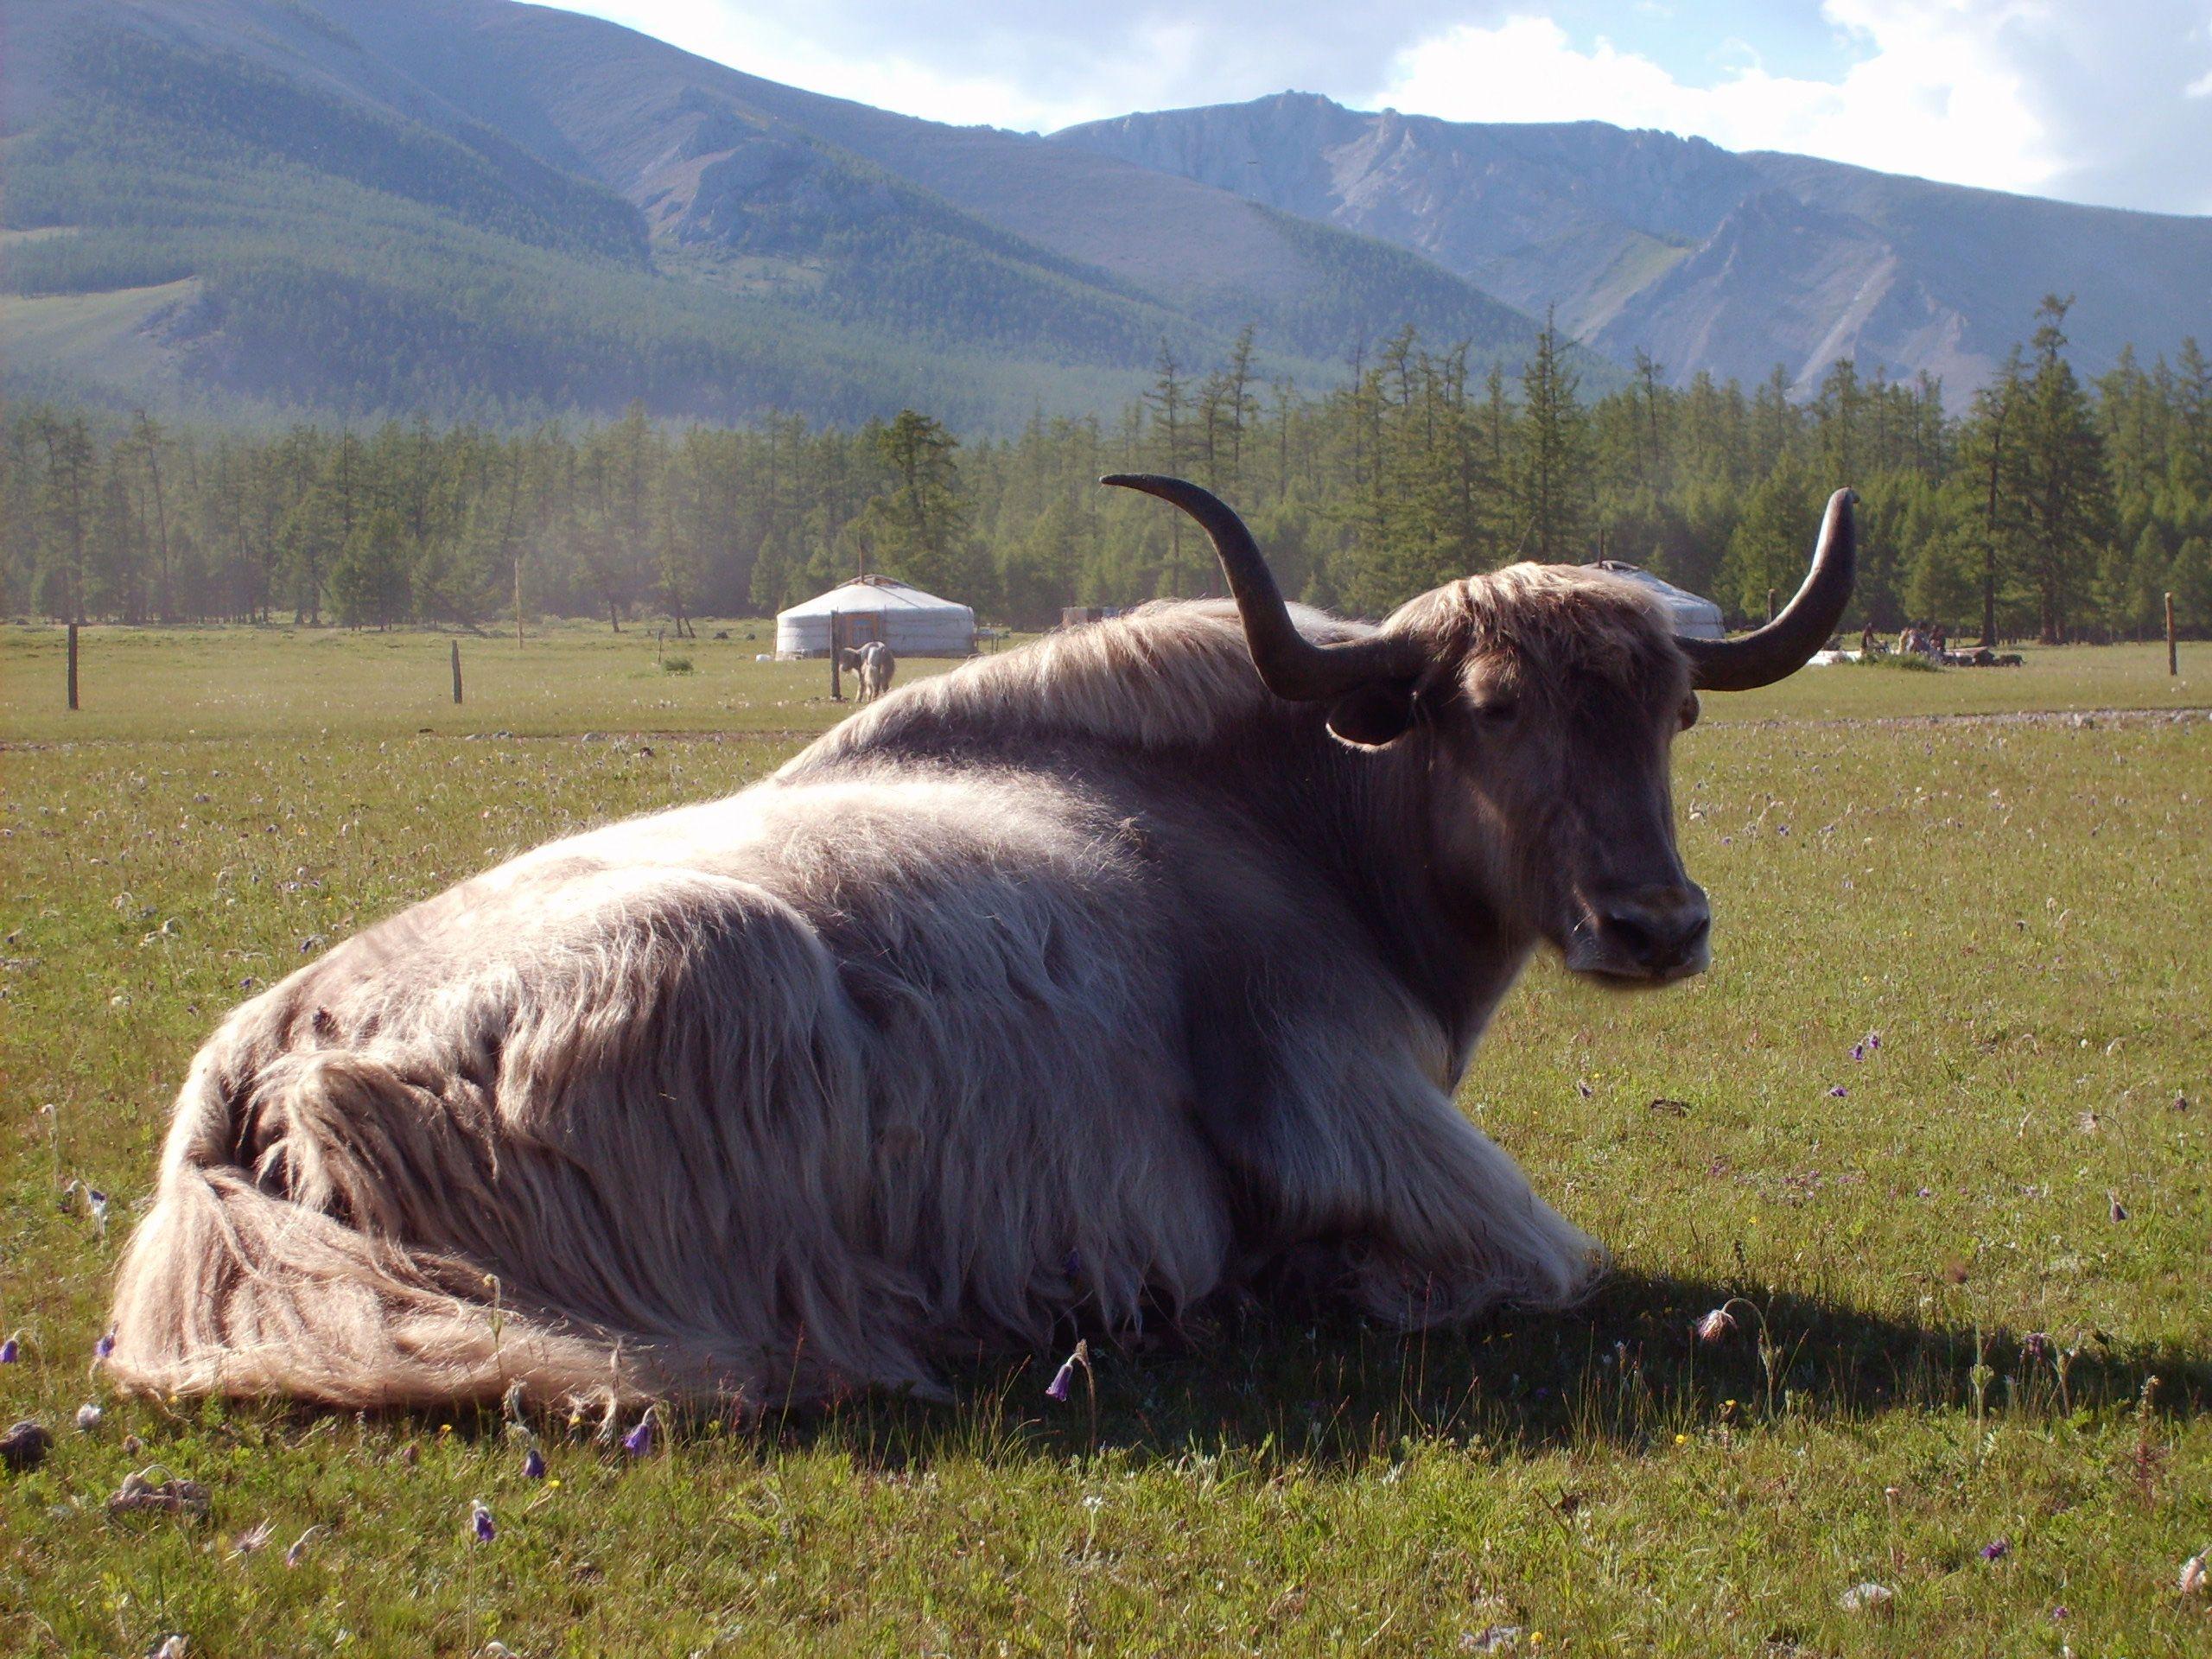 Image Of A Yak: FREE Image On LibreShot